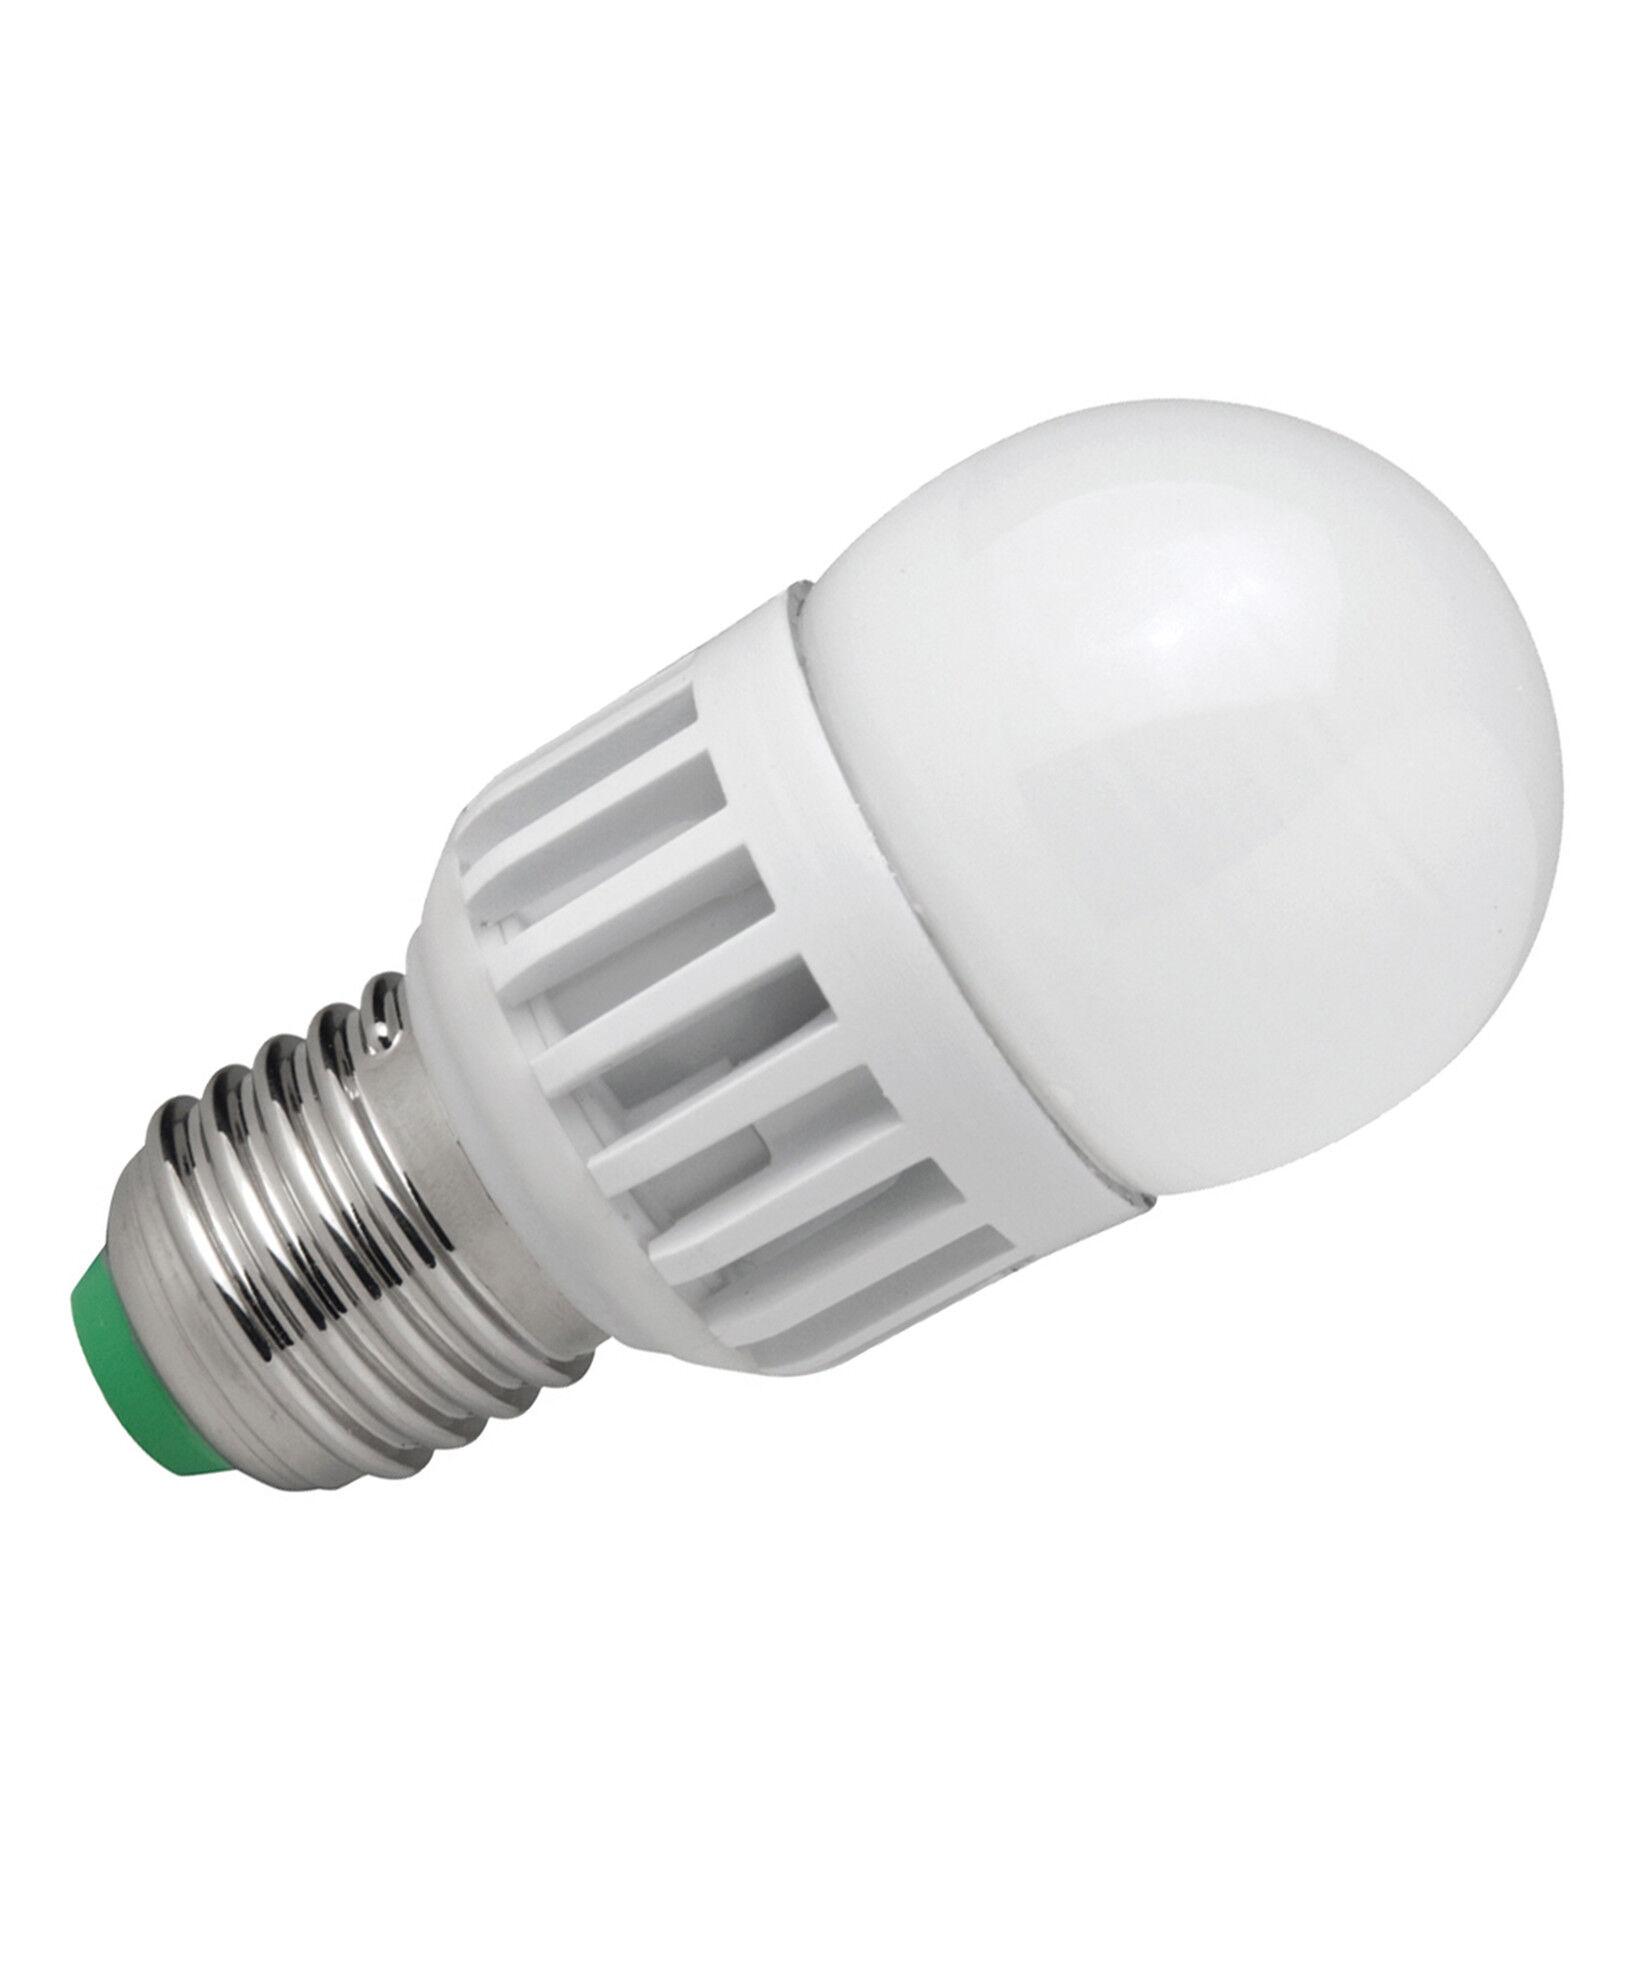 Megaman Lamppu LED 5W Classic Himmennettävissä E27 - Megaman